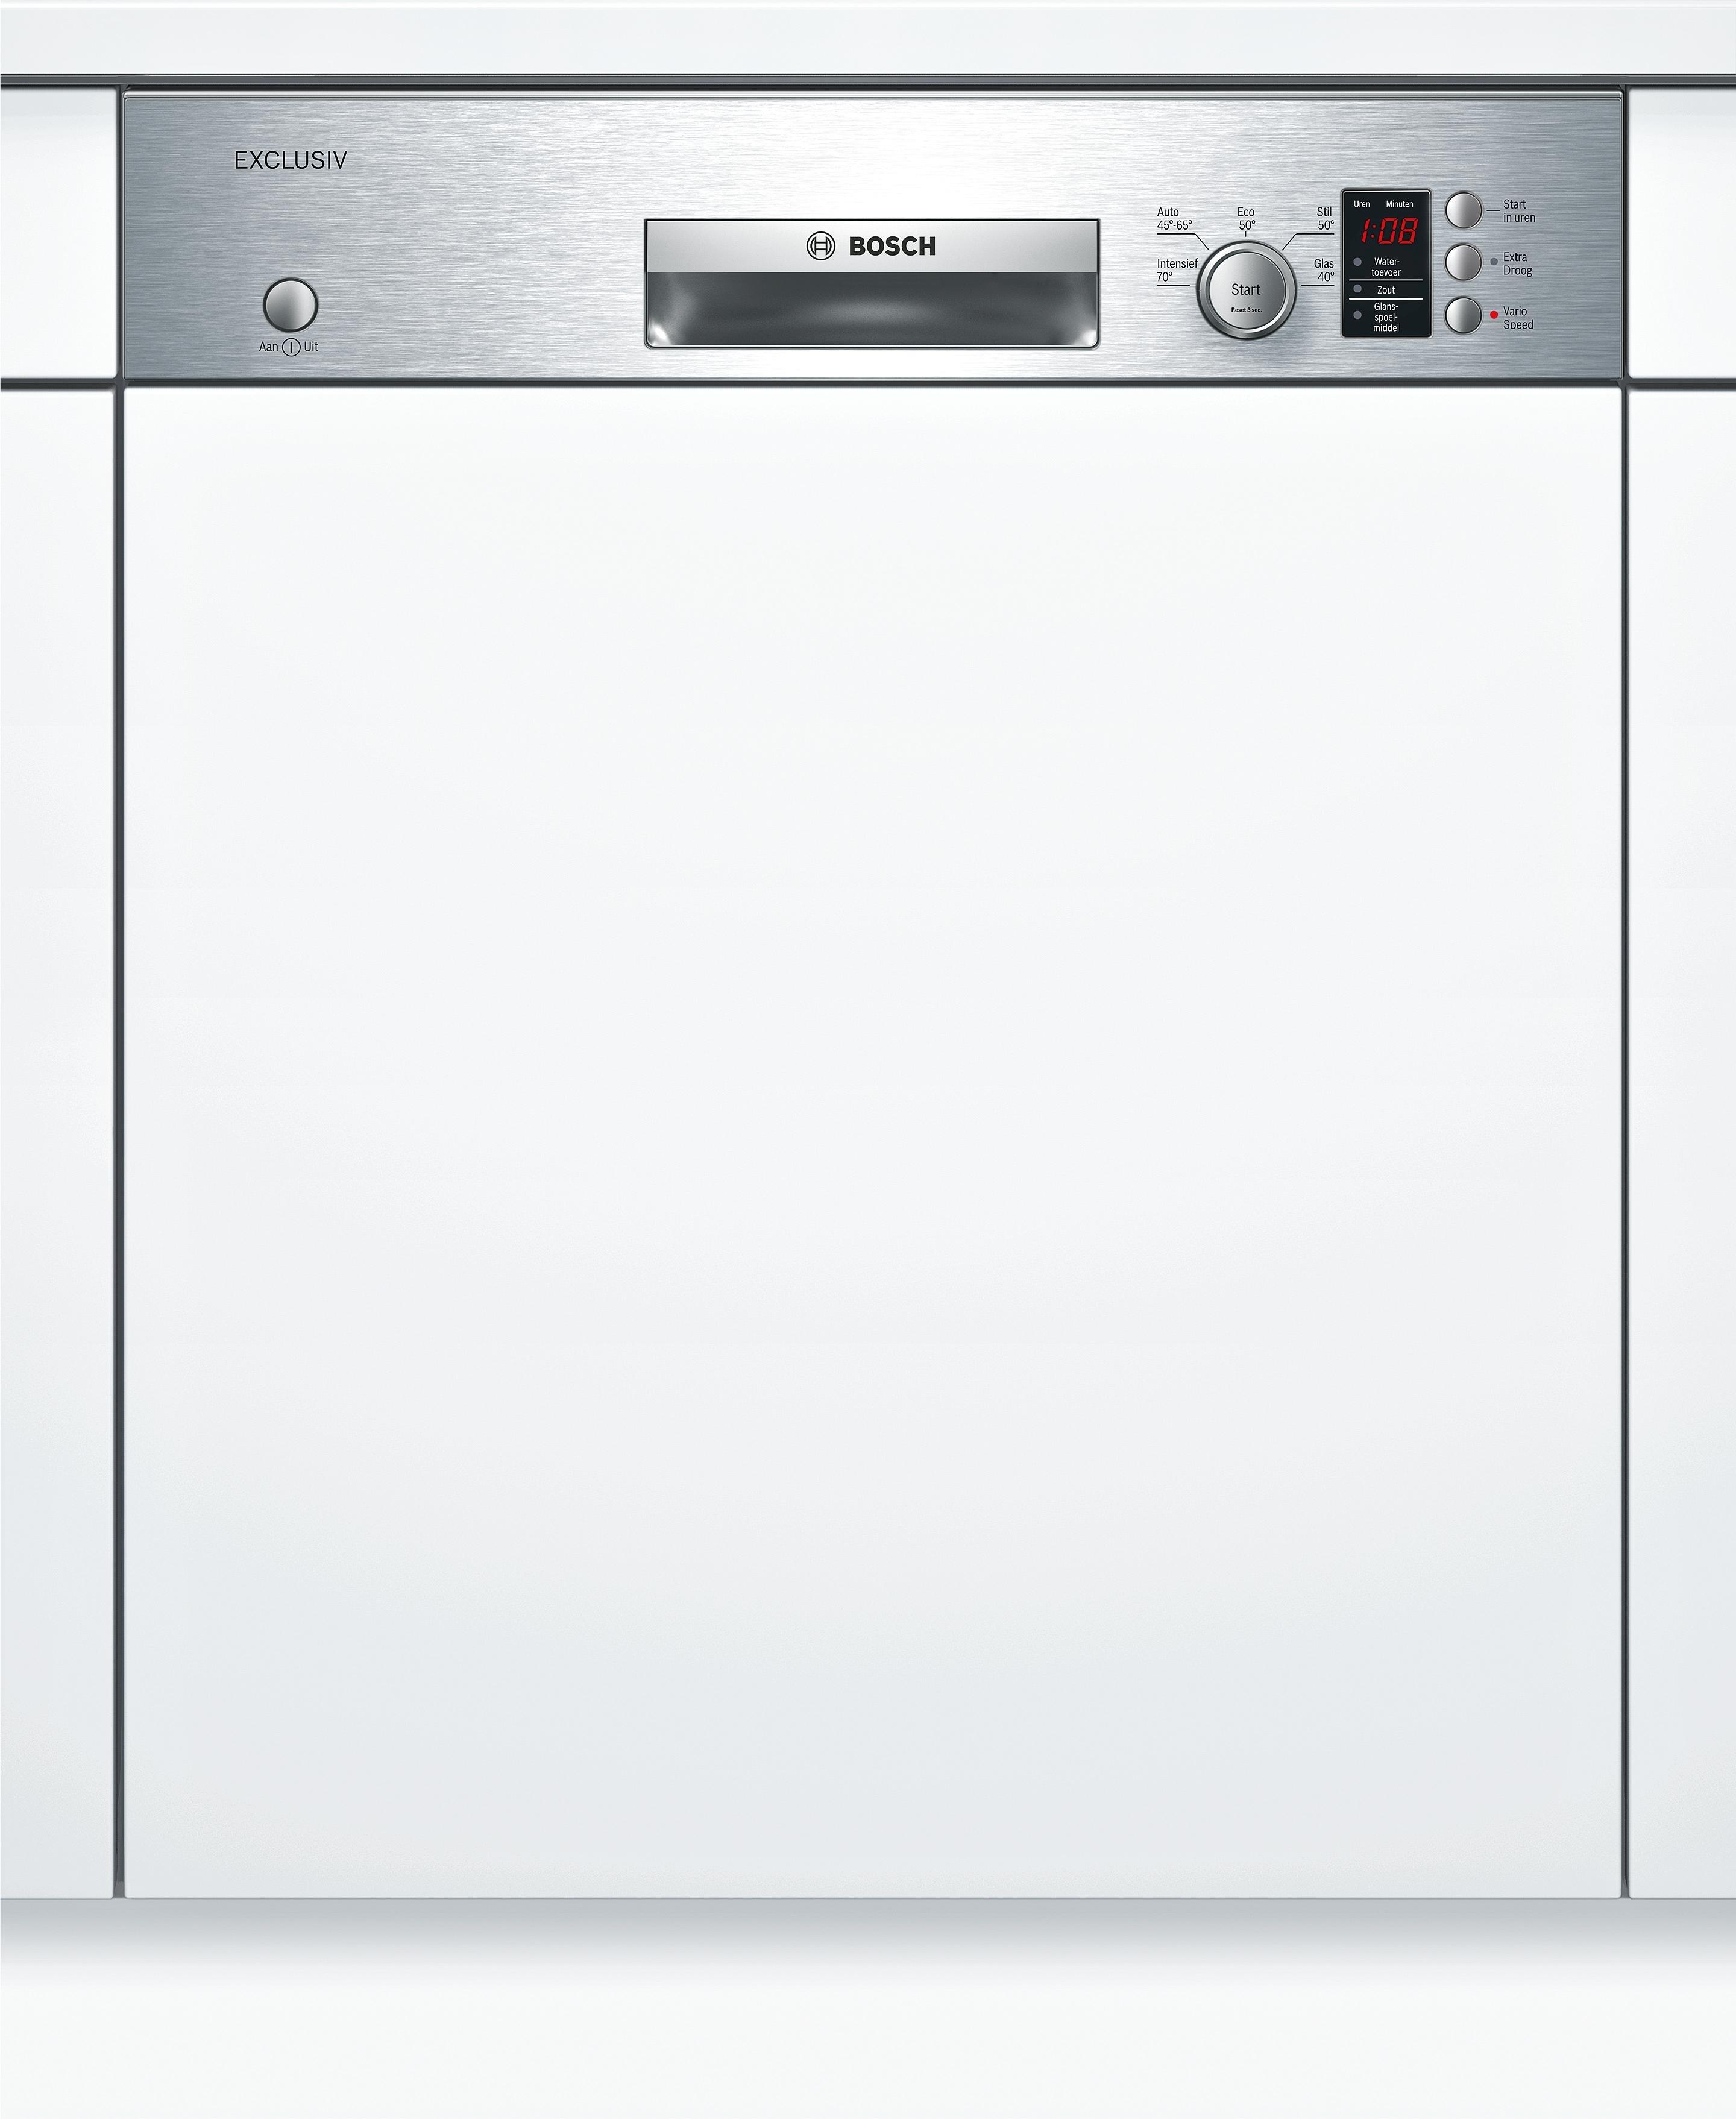 Bosch ge�ntegreerde vaatwasser SMI25GS00N